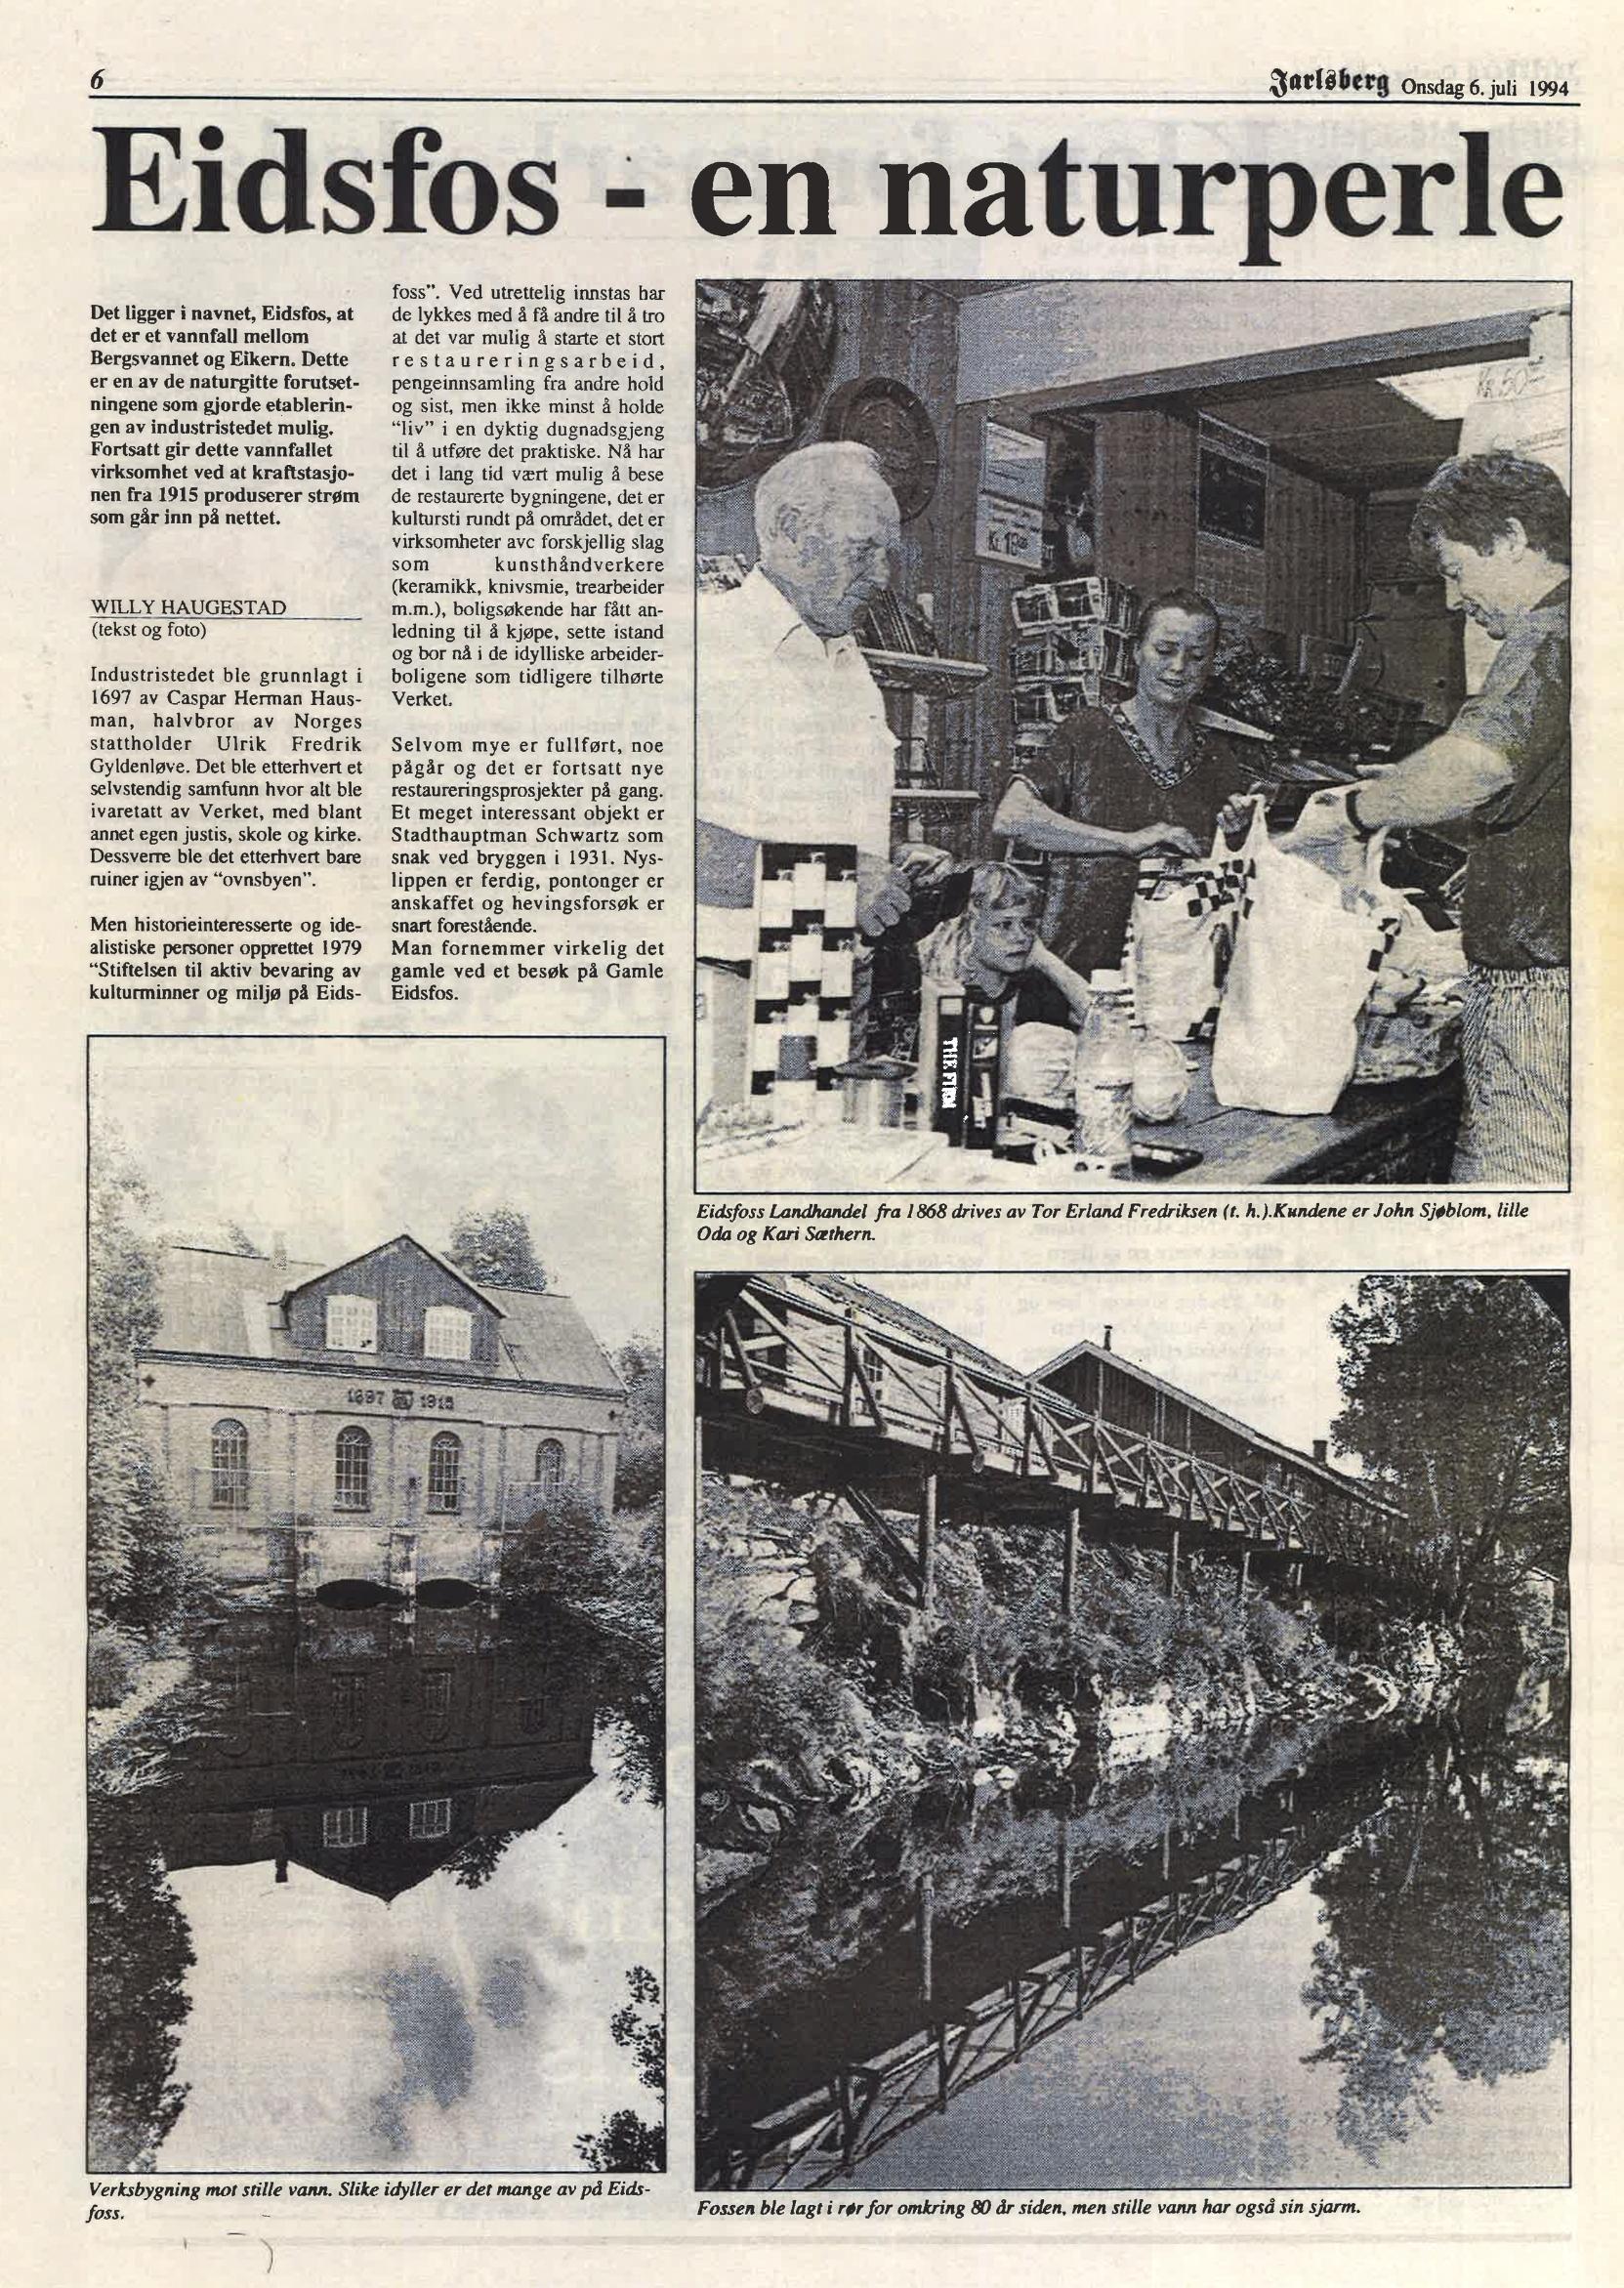 Jarlsberg Avis 6. juli 1994